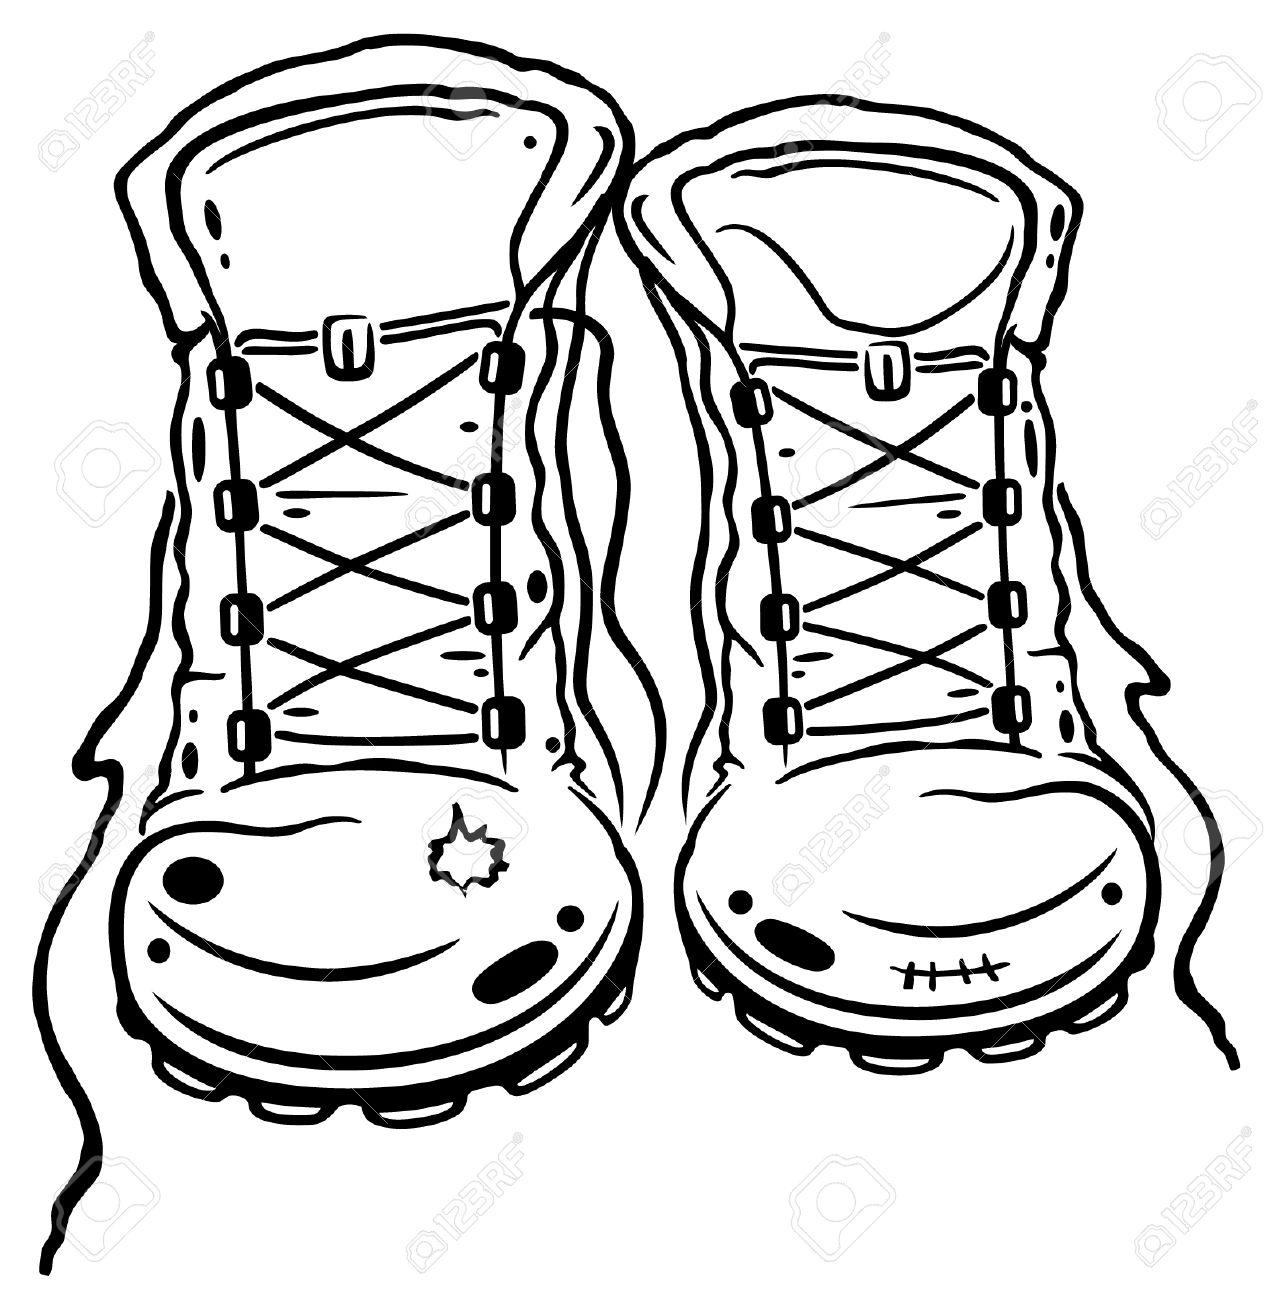 Army Boot Print Clip Art